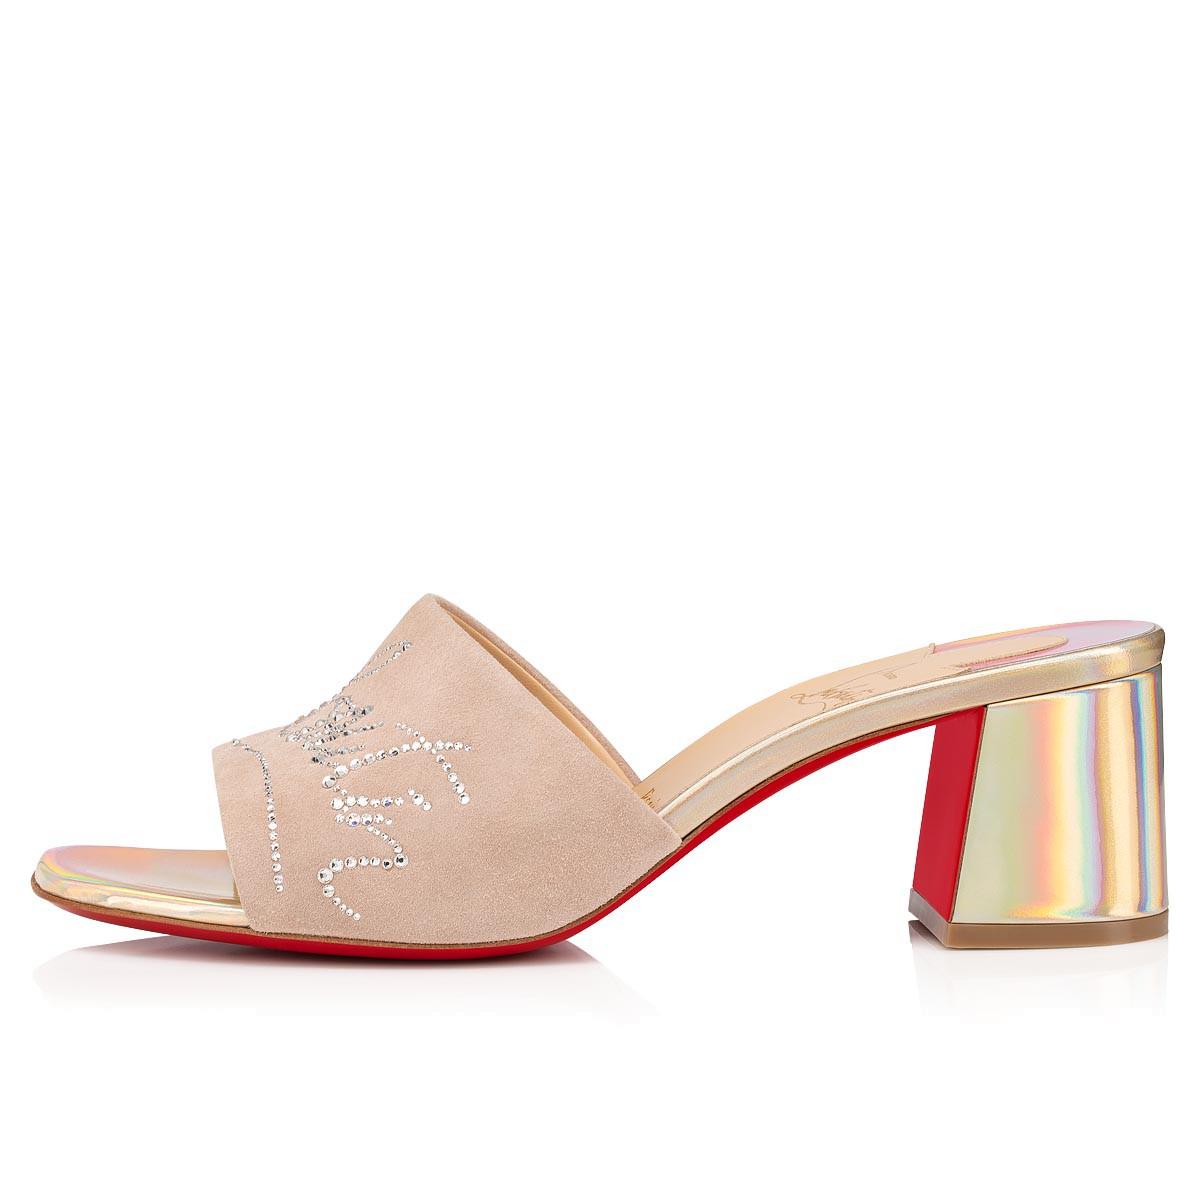 Shoes - Dear Home - Christian Louboutin